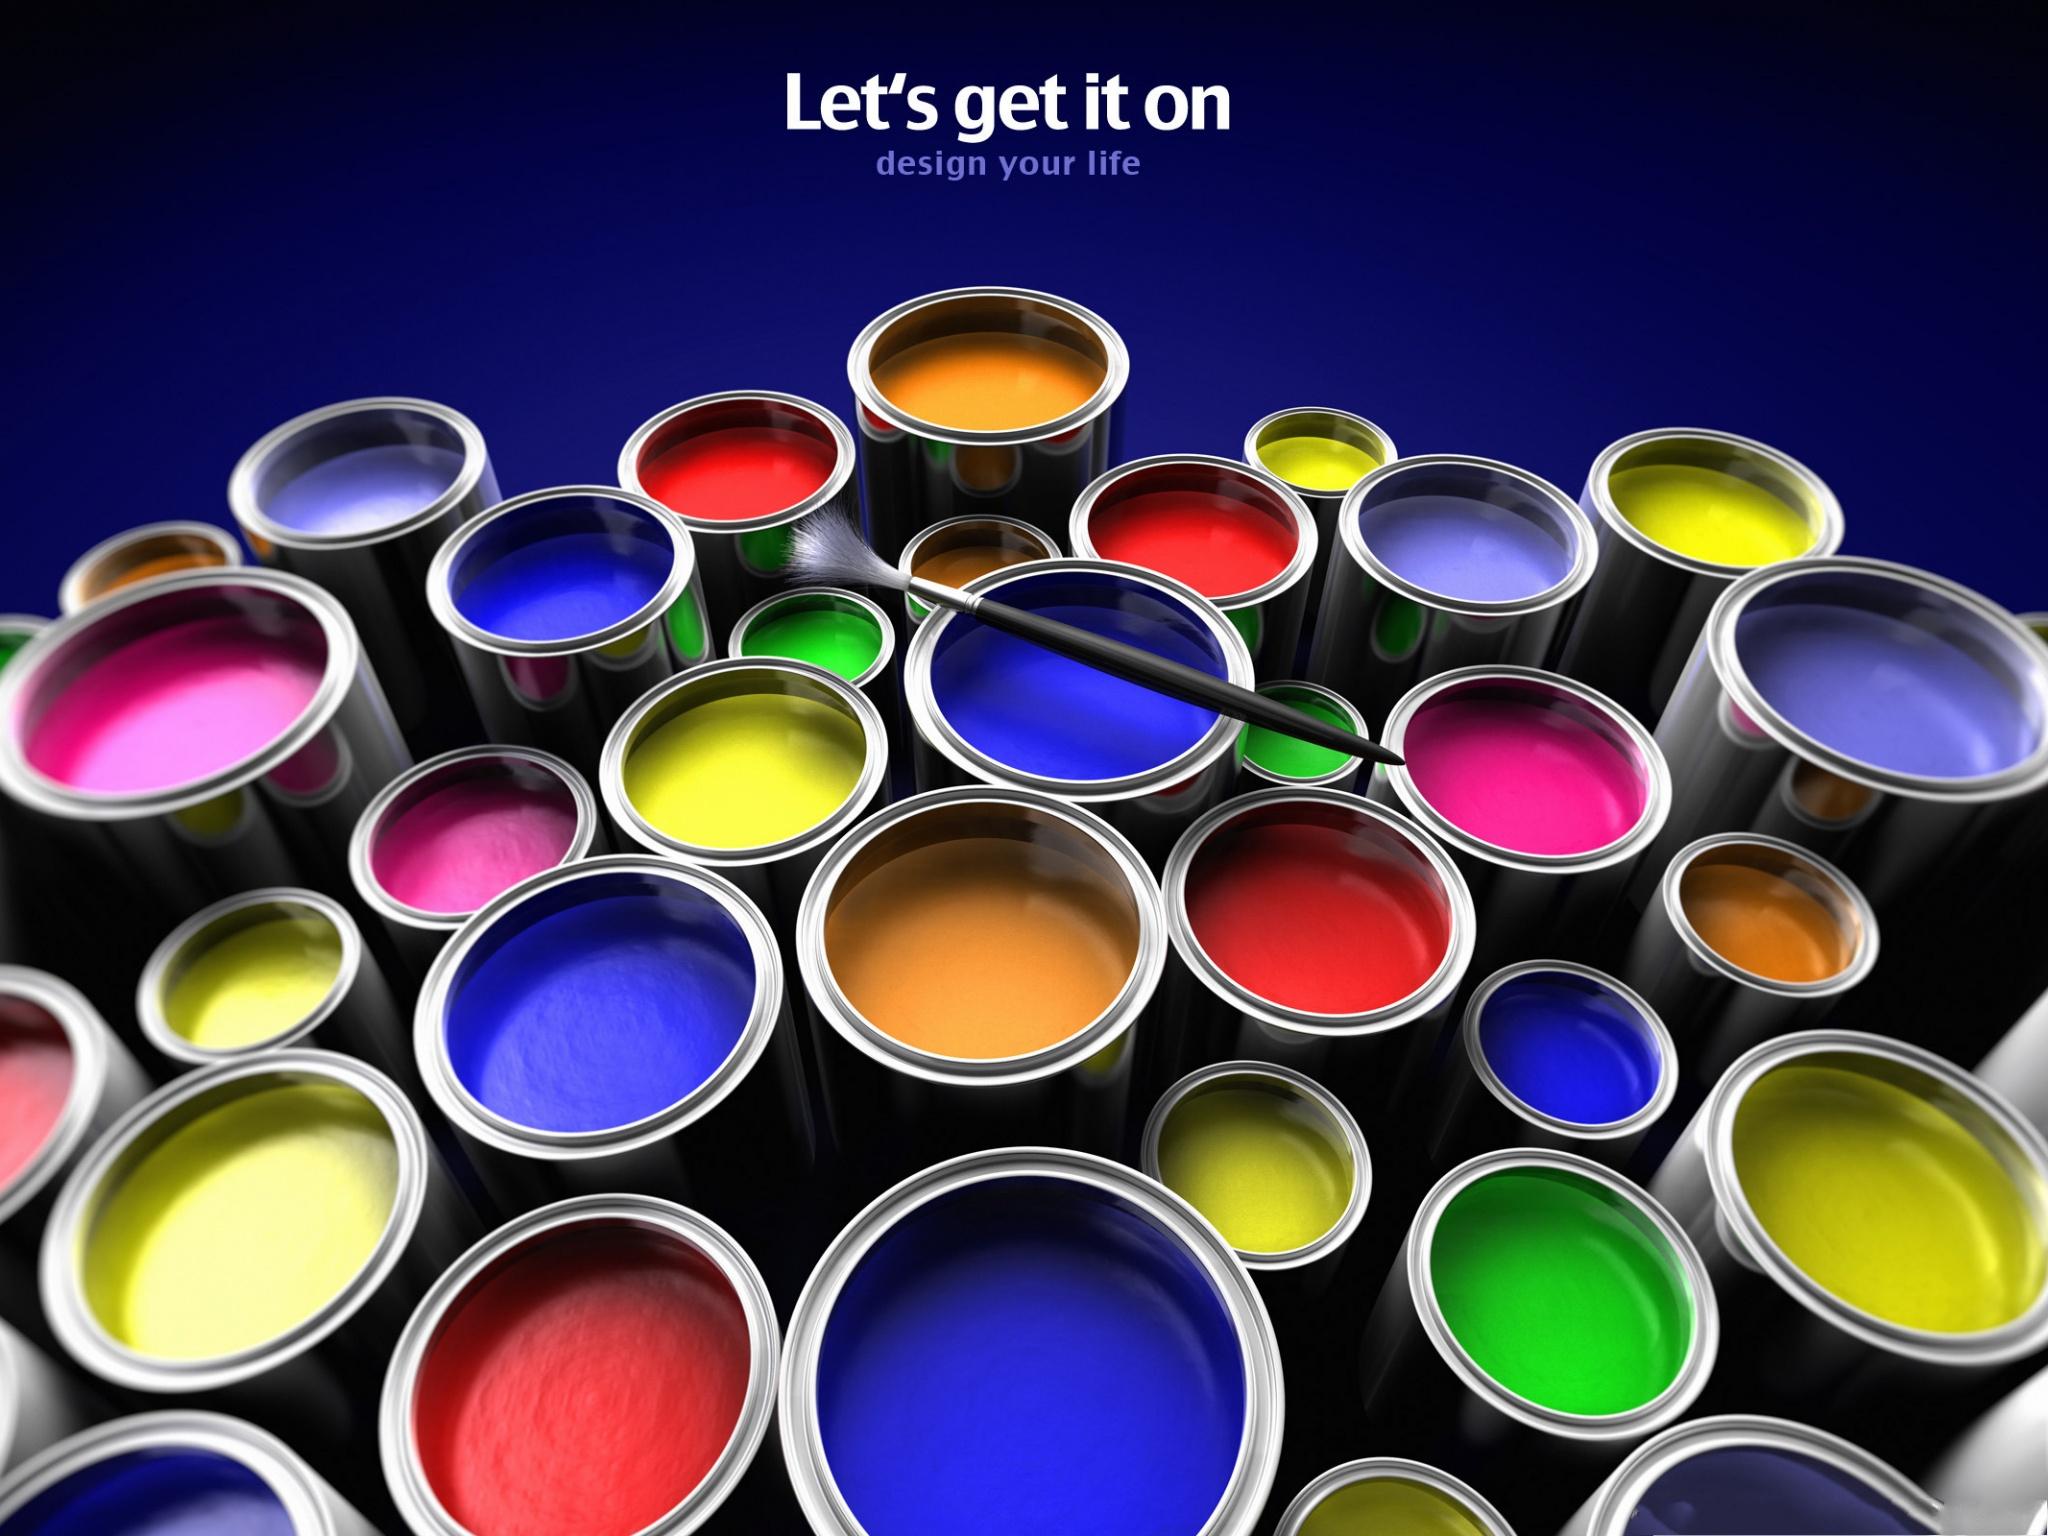 [47+] Wallpaper You Can Paint on WallpaperSafari